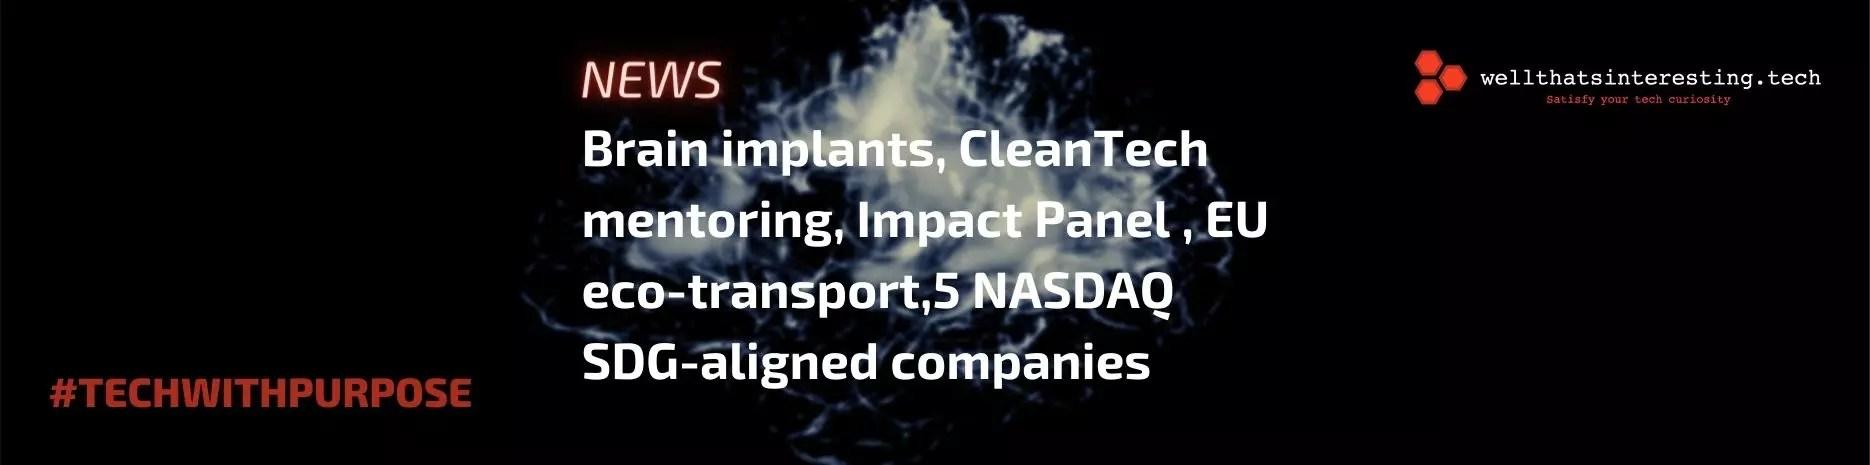 Brain implants, CleanTech, Impact Panel and … Tartan - cleantech